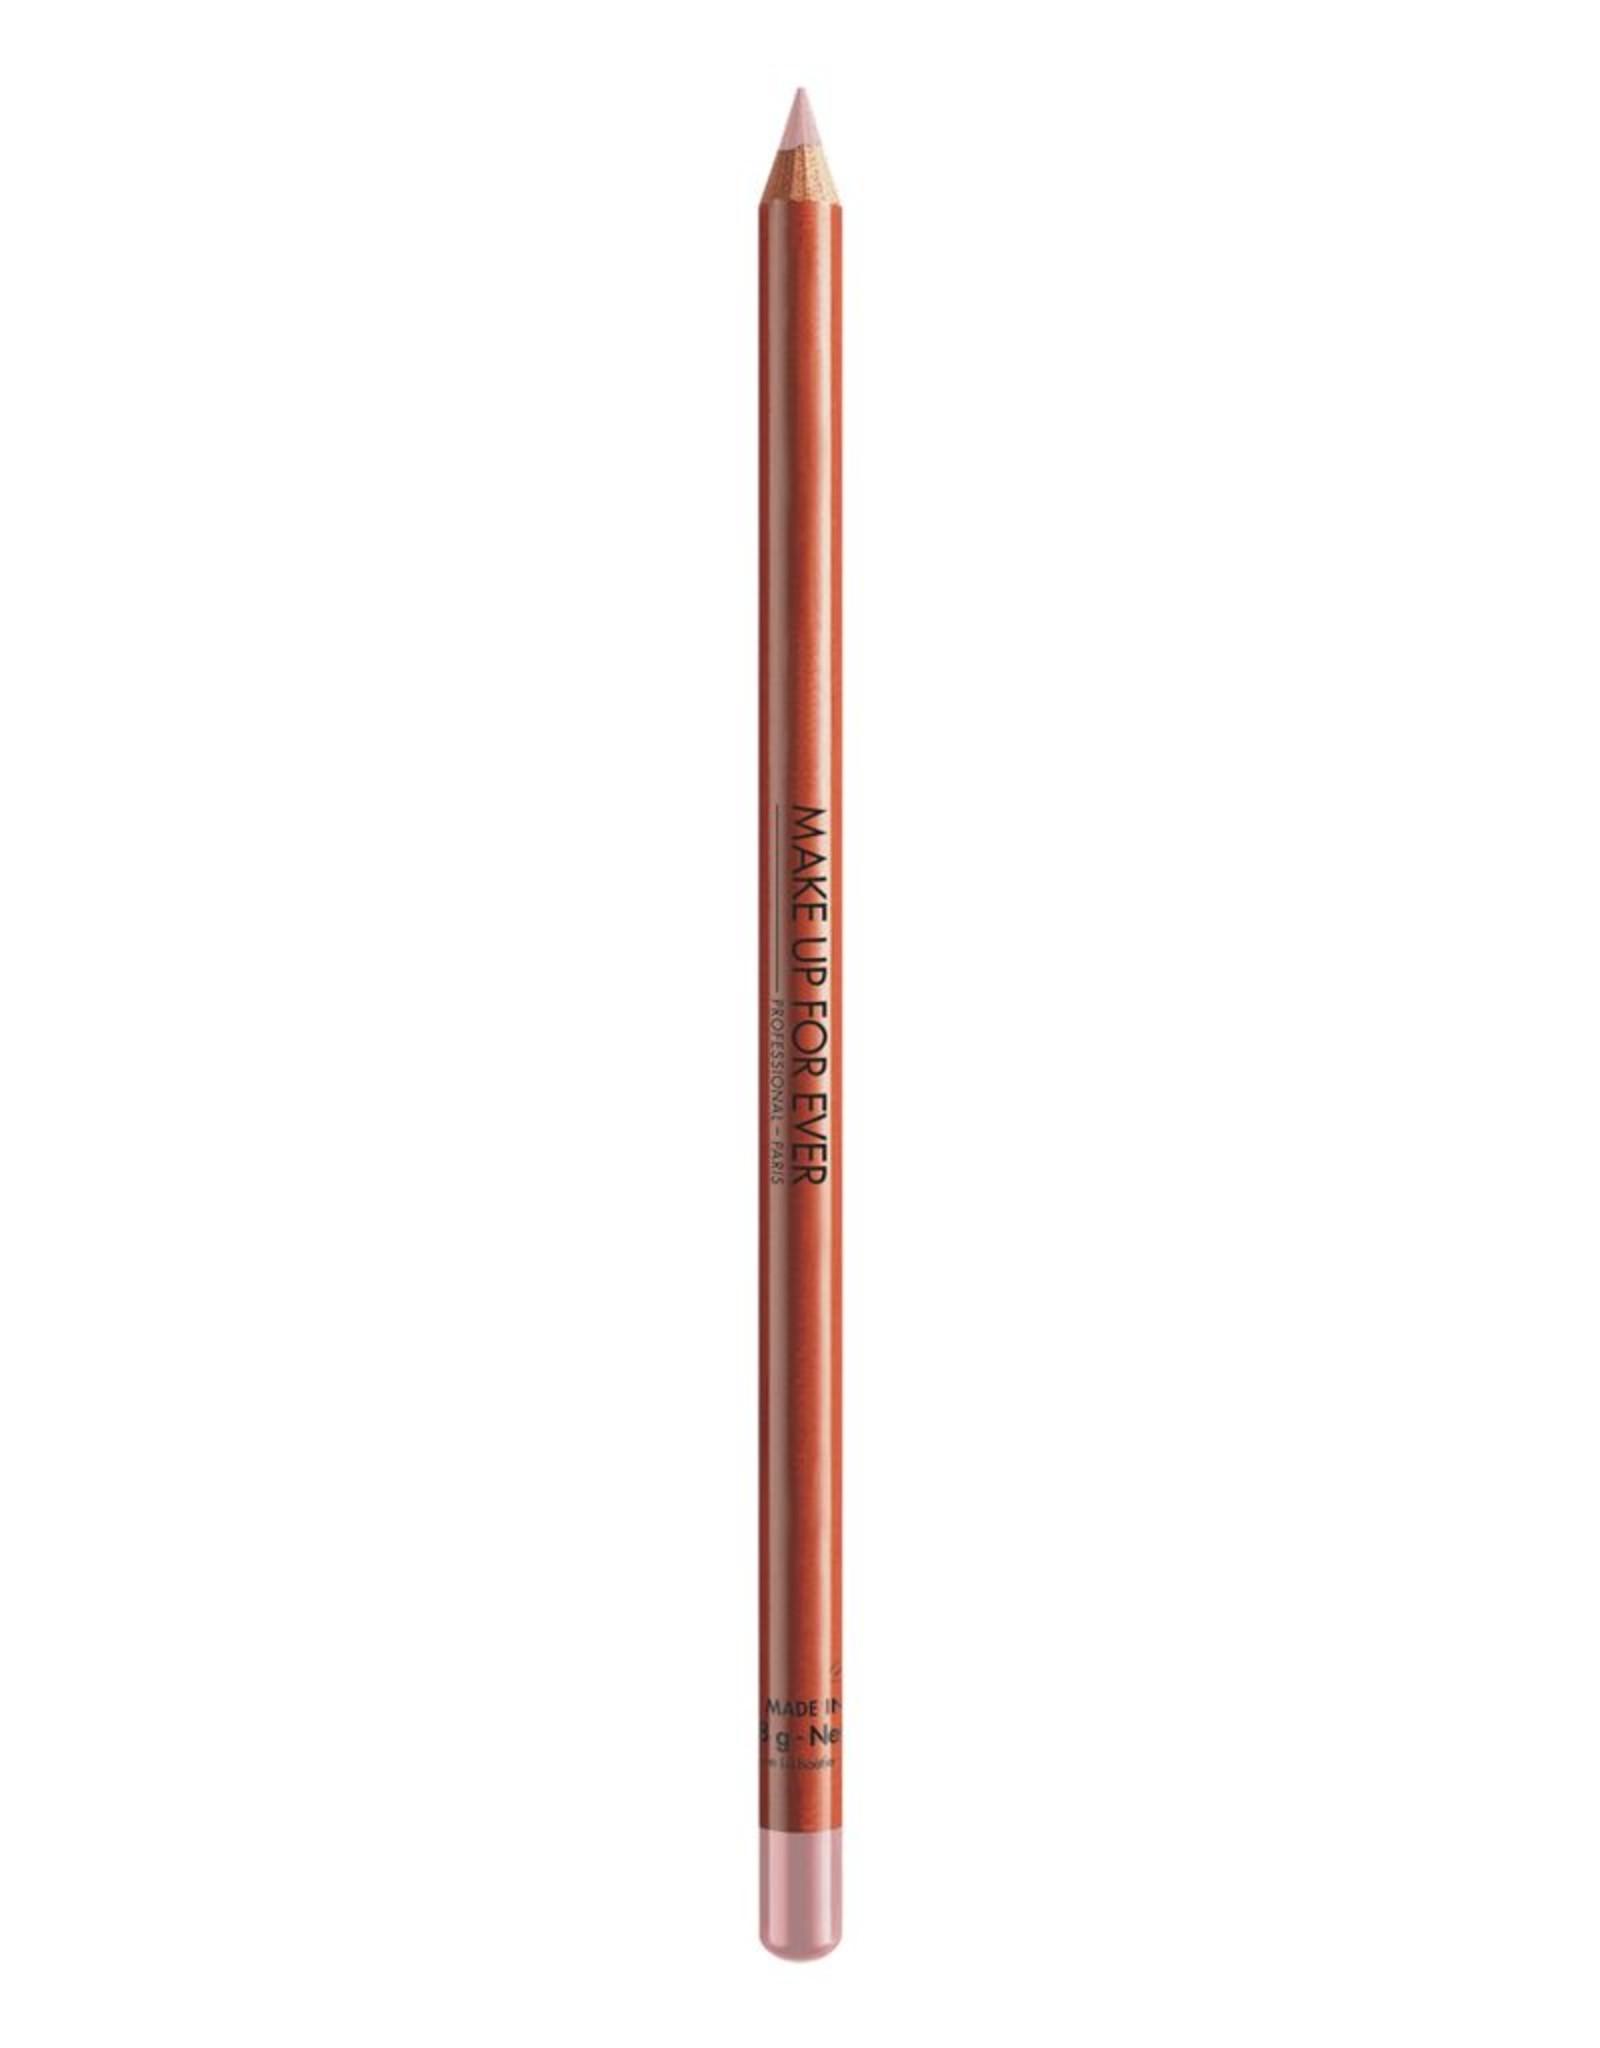 MUFE CRAYON LEVRES 1,8g N50 beige chaud /  warmNude